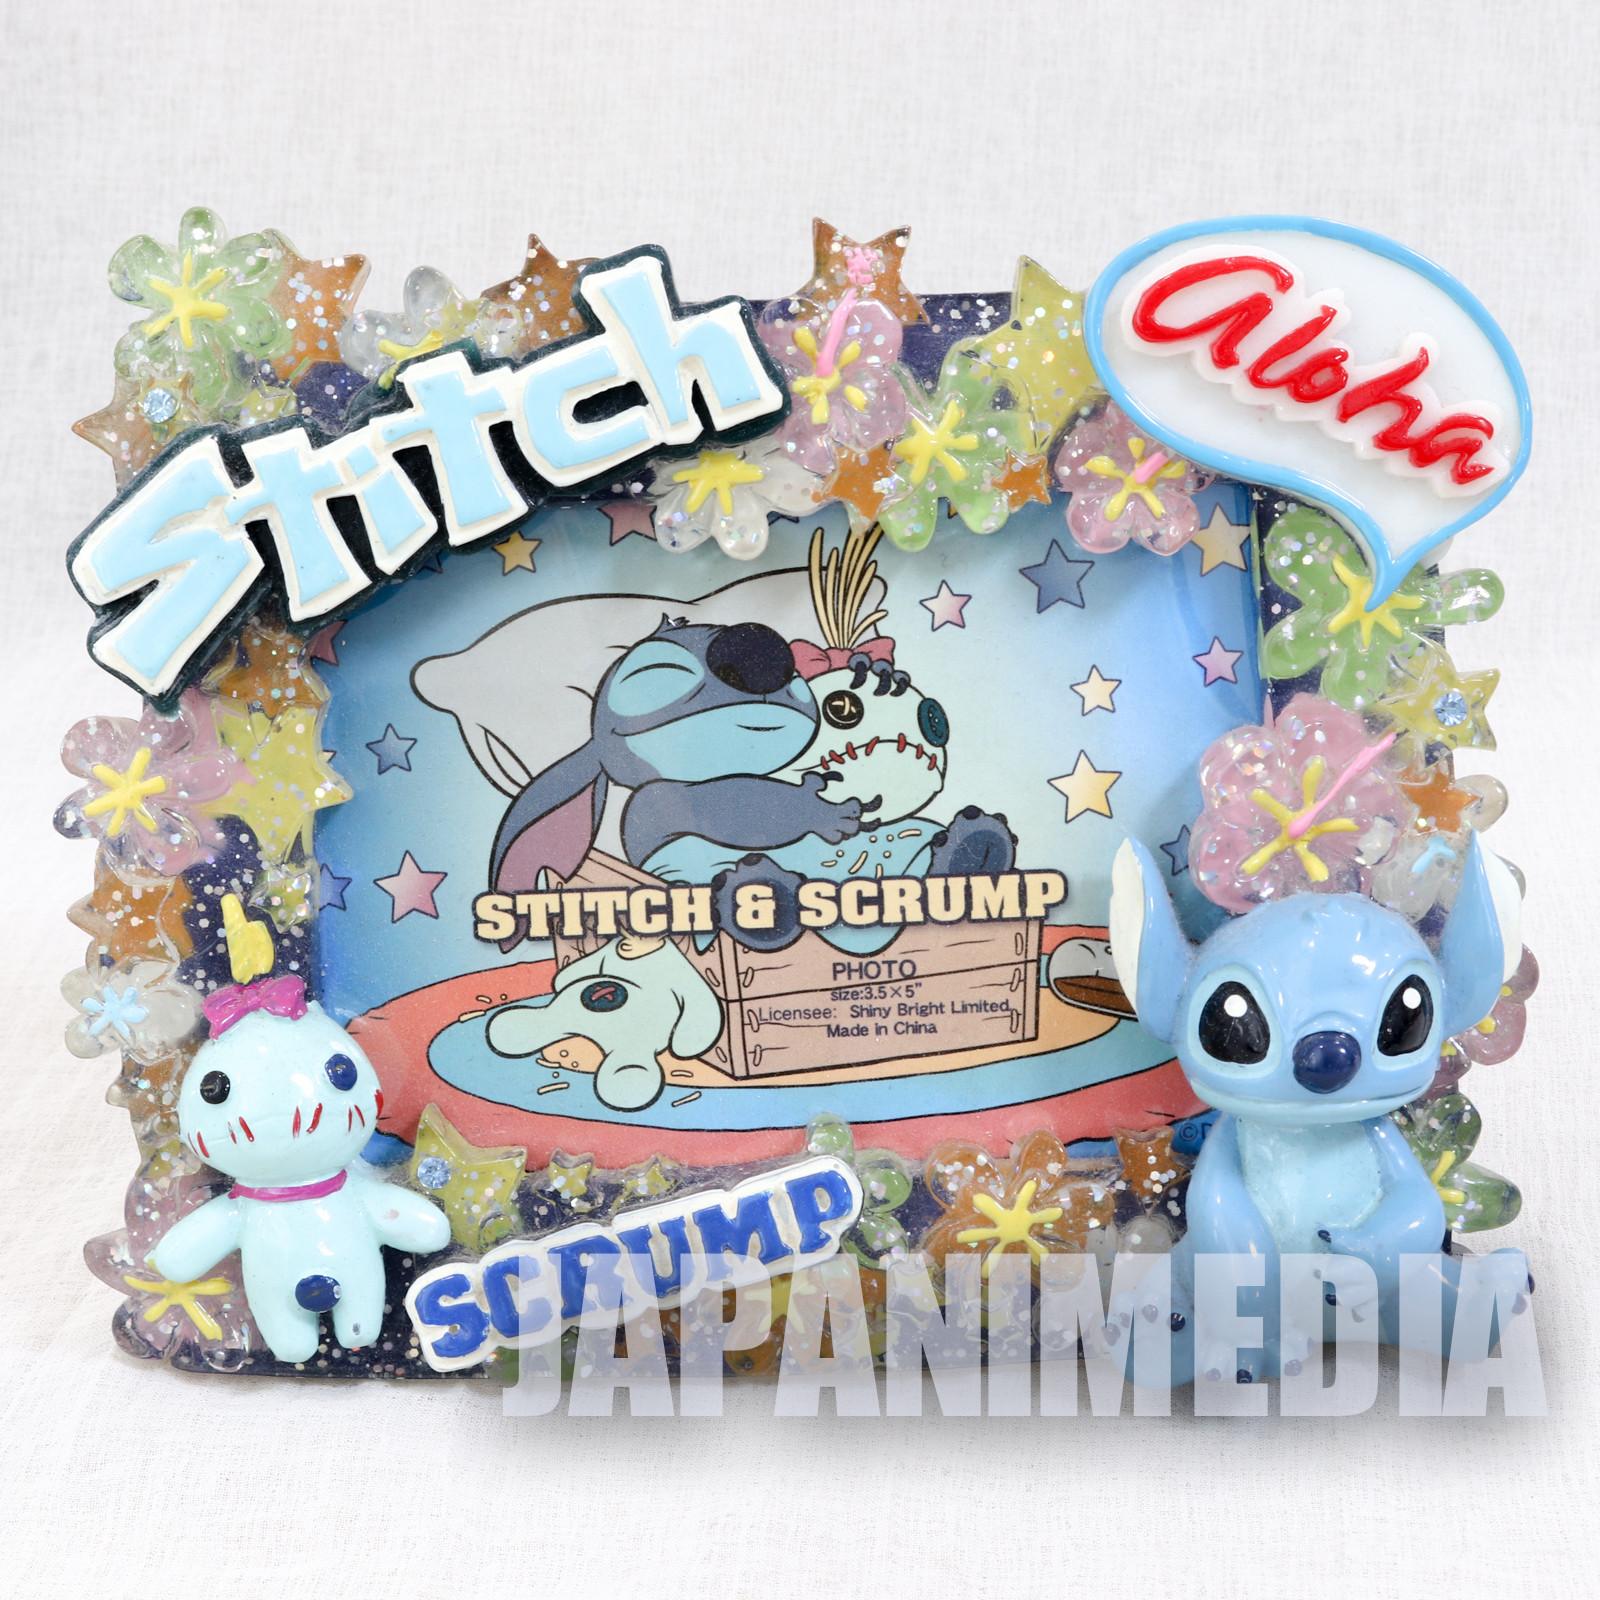 Stitch & Scrump Photo Frame Stand Disney